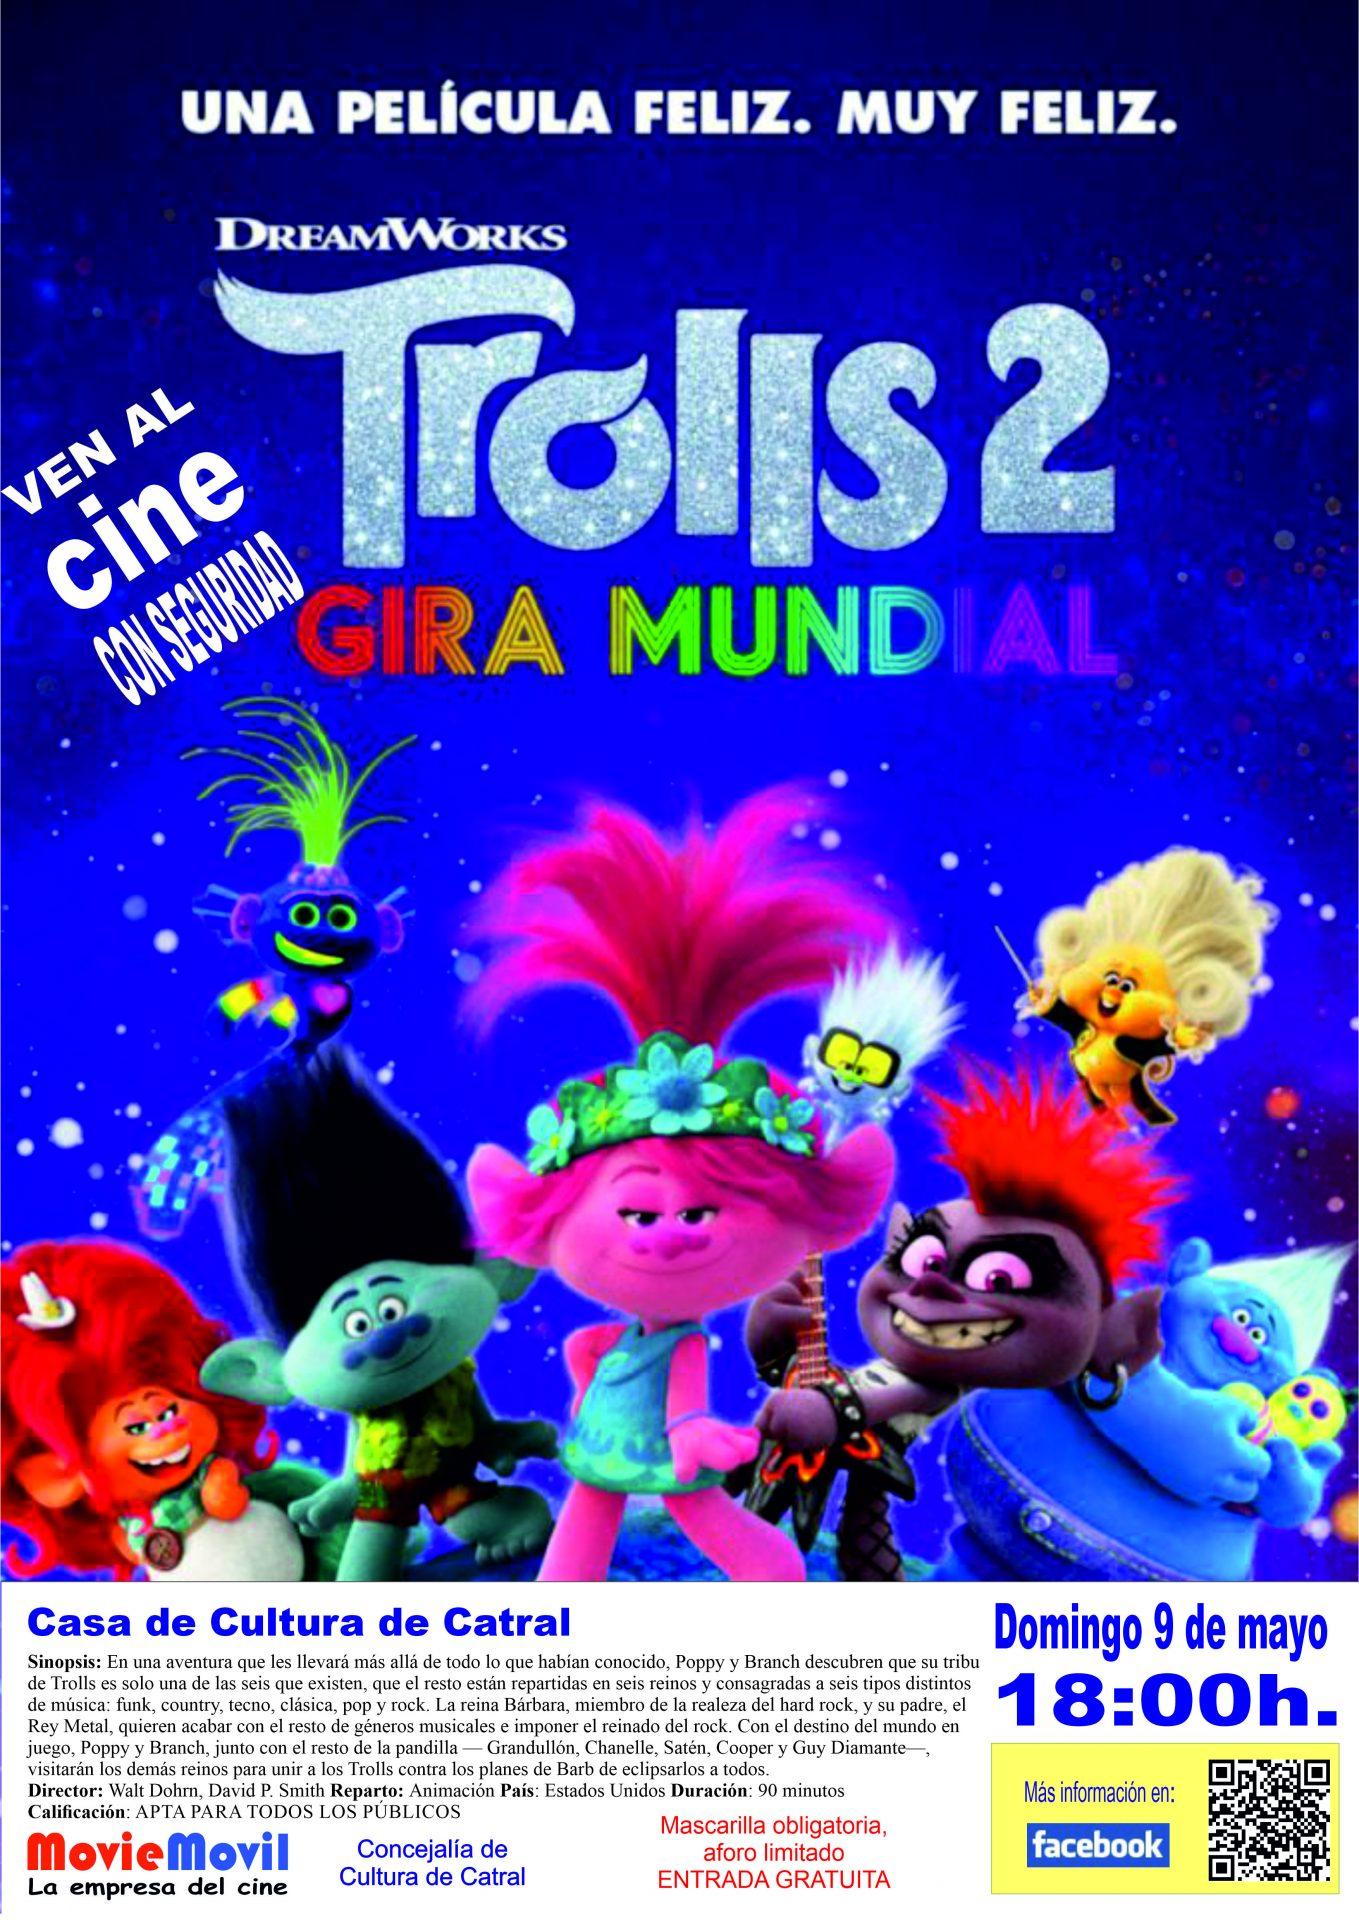 Cine - Trolls 2 Gira mundial